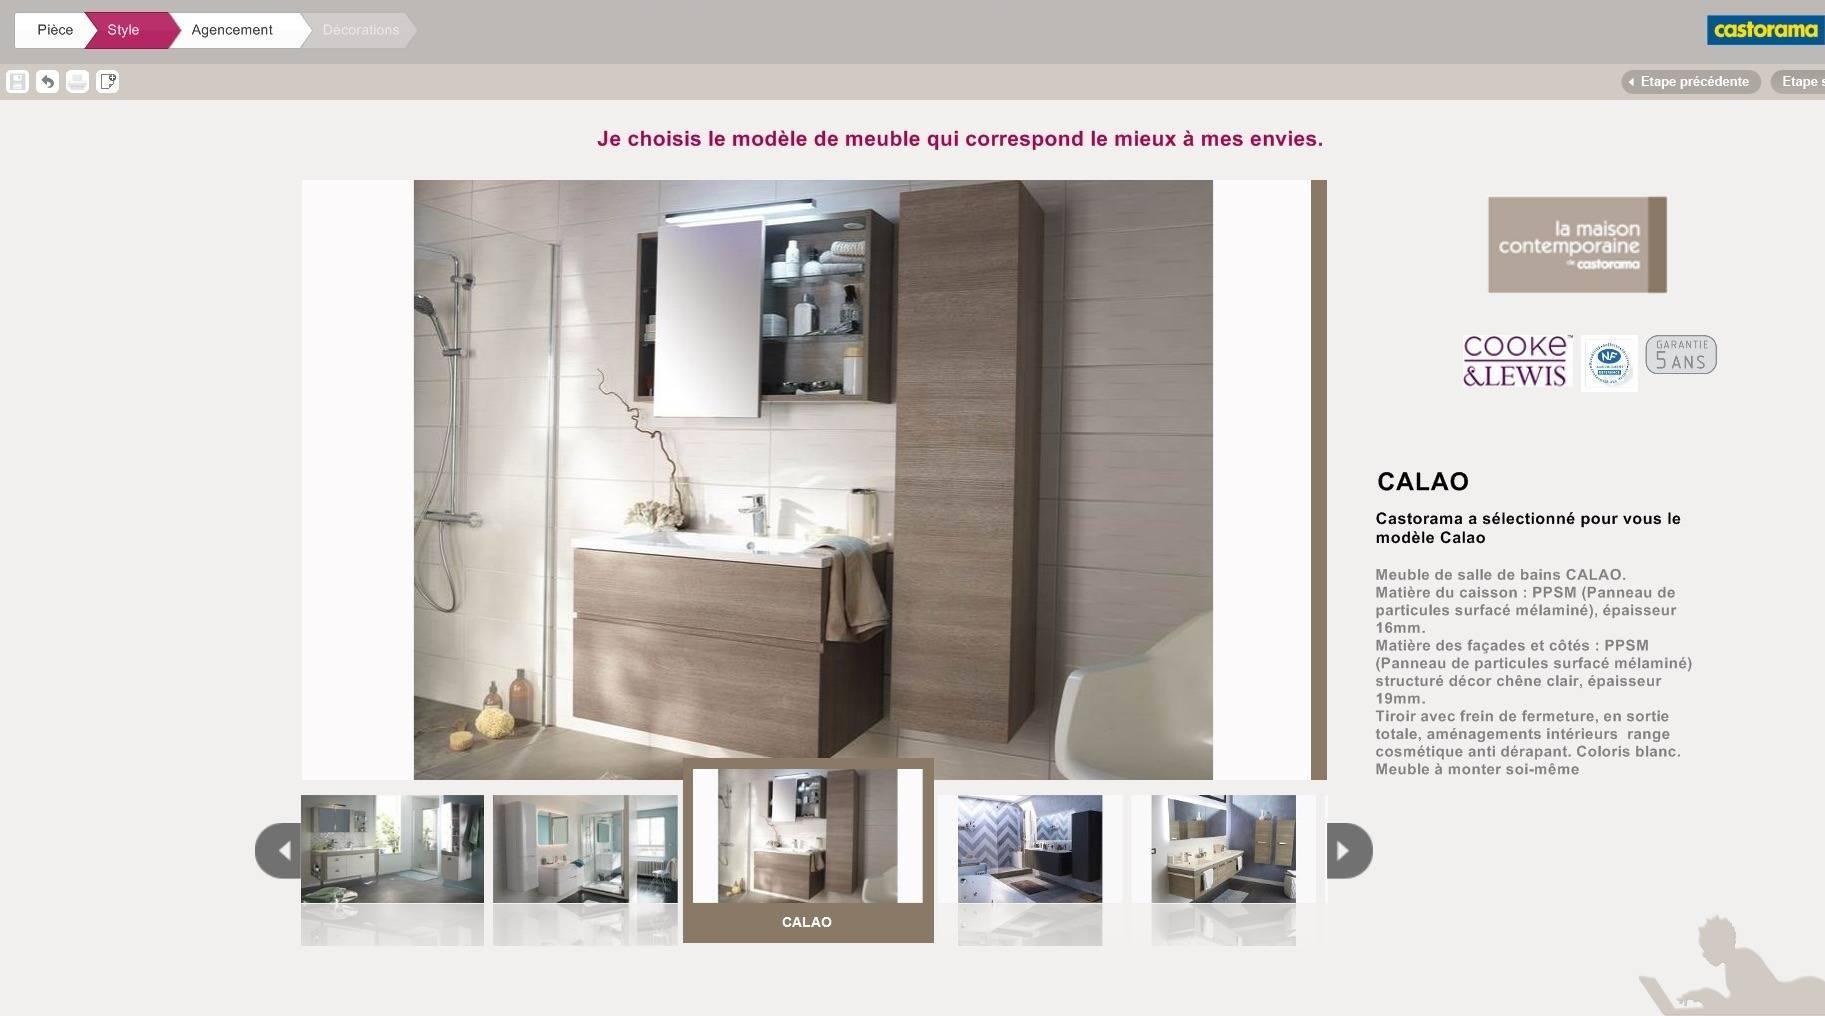 New Outil Salle De Bain Castorama